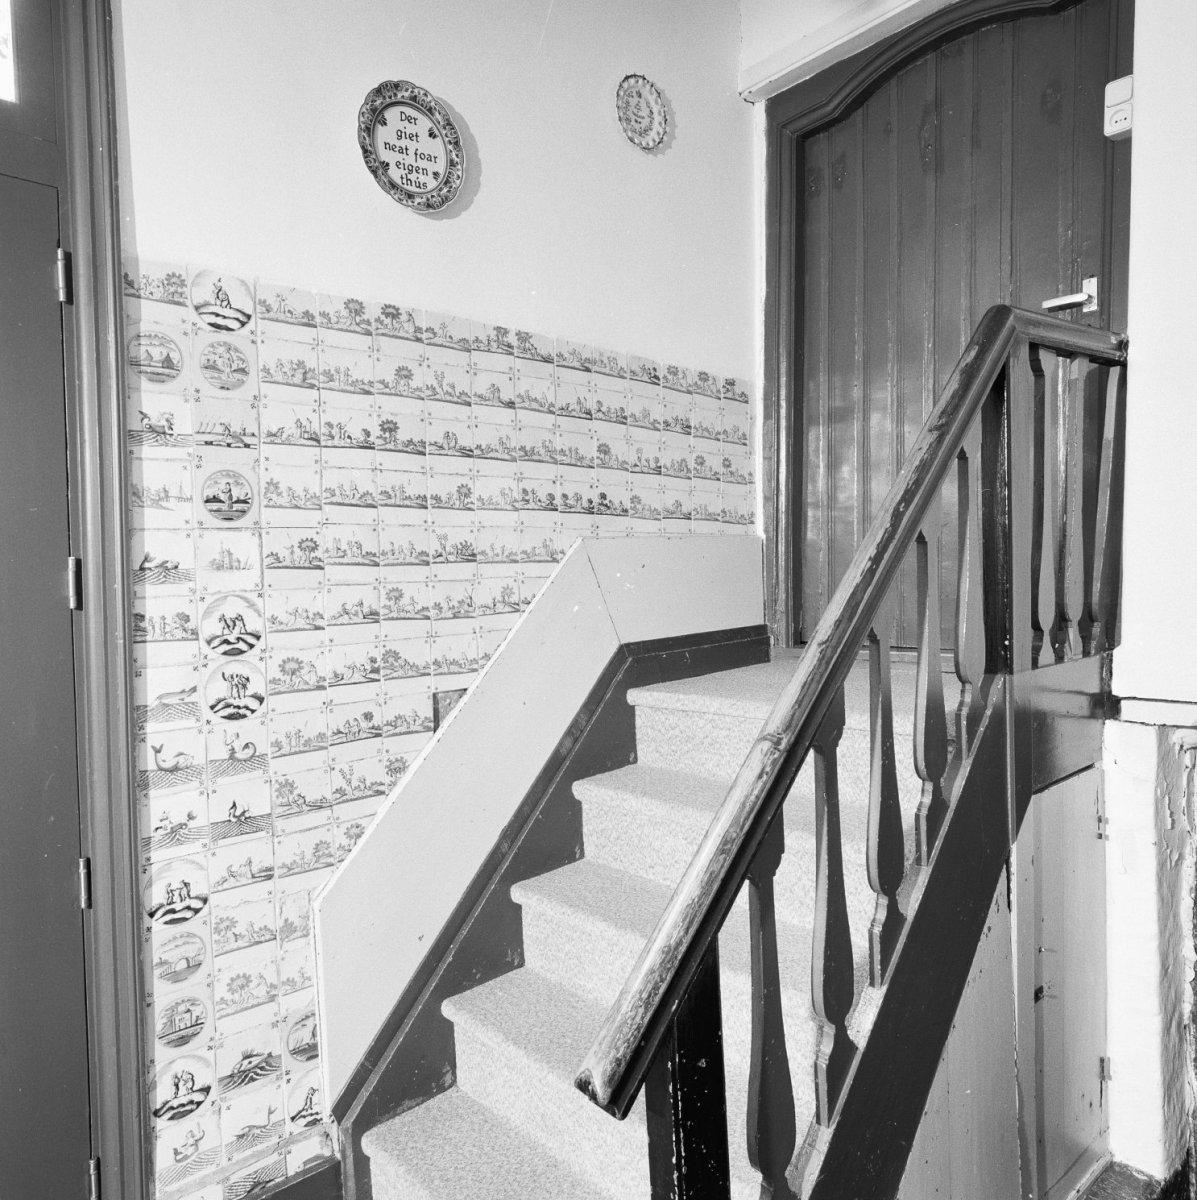 File interieur overzicht hal met beschilderde tegels en trap 20000566 wikimedia - Interieur trap model ...